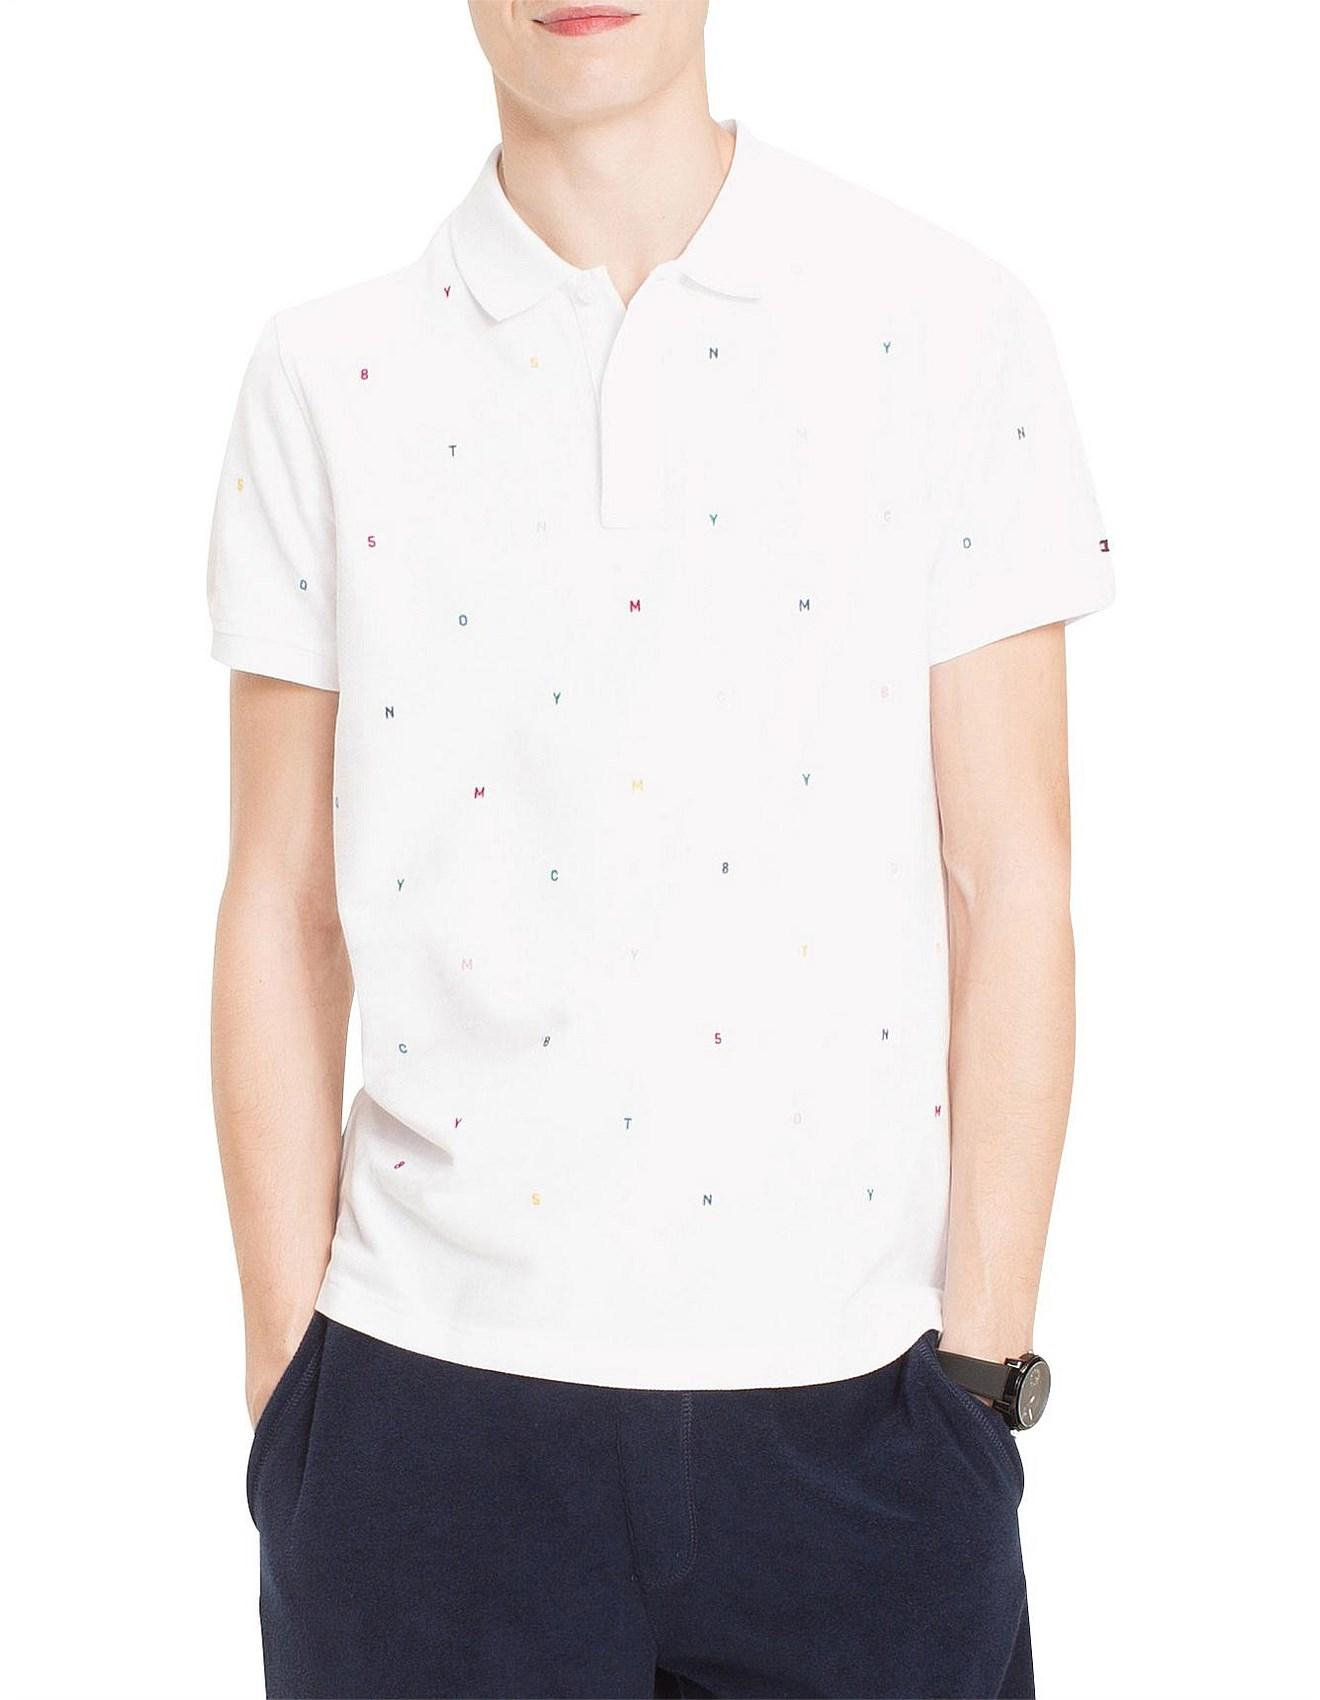 Mens Polo Shirts Sale Buy Polo Shirts Online David Jones